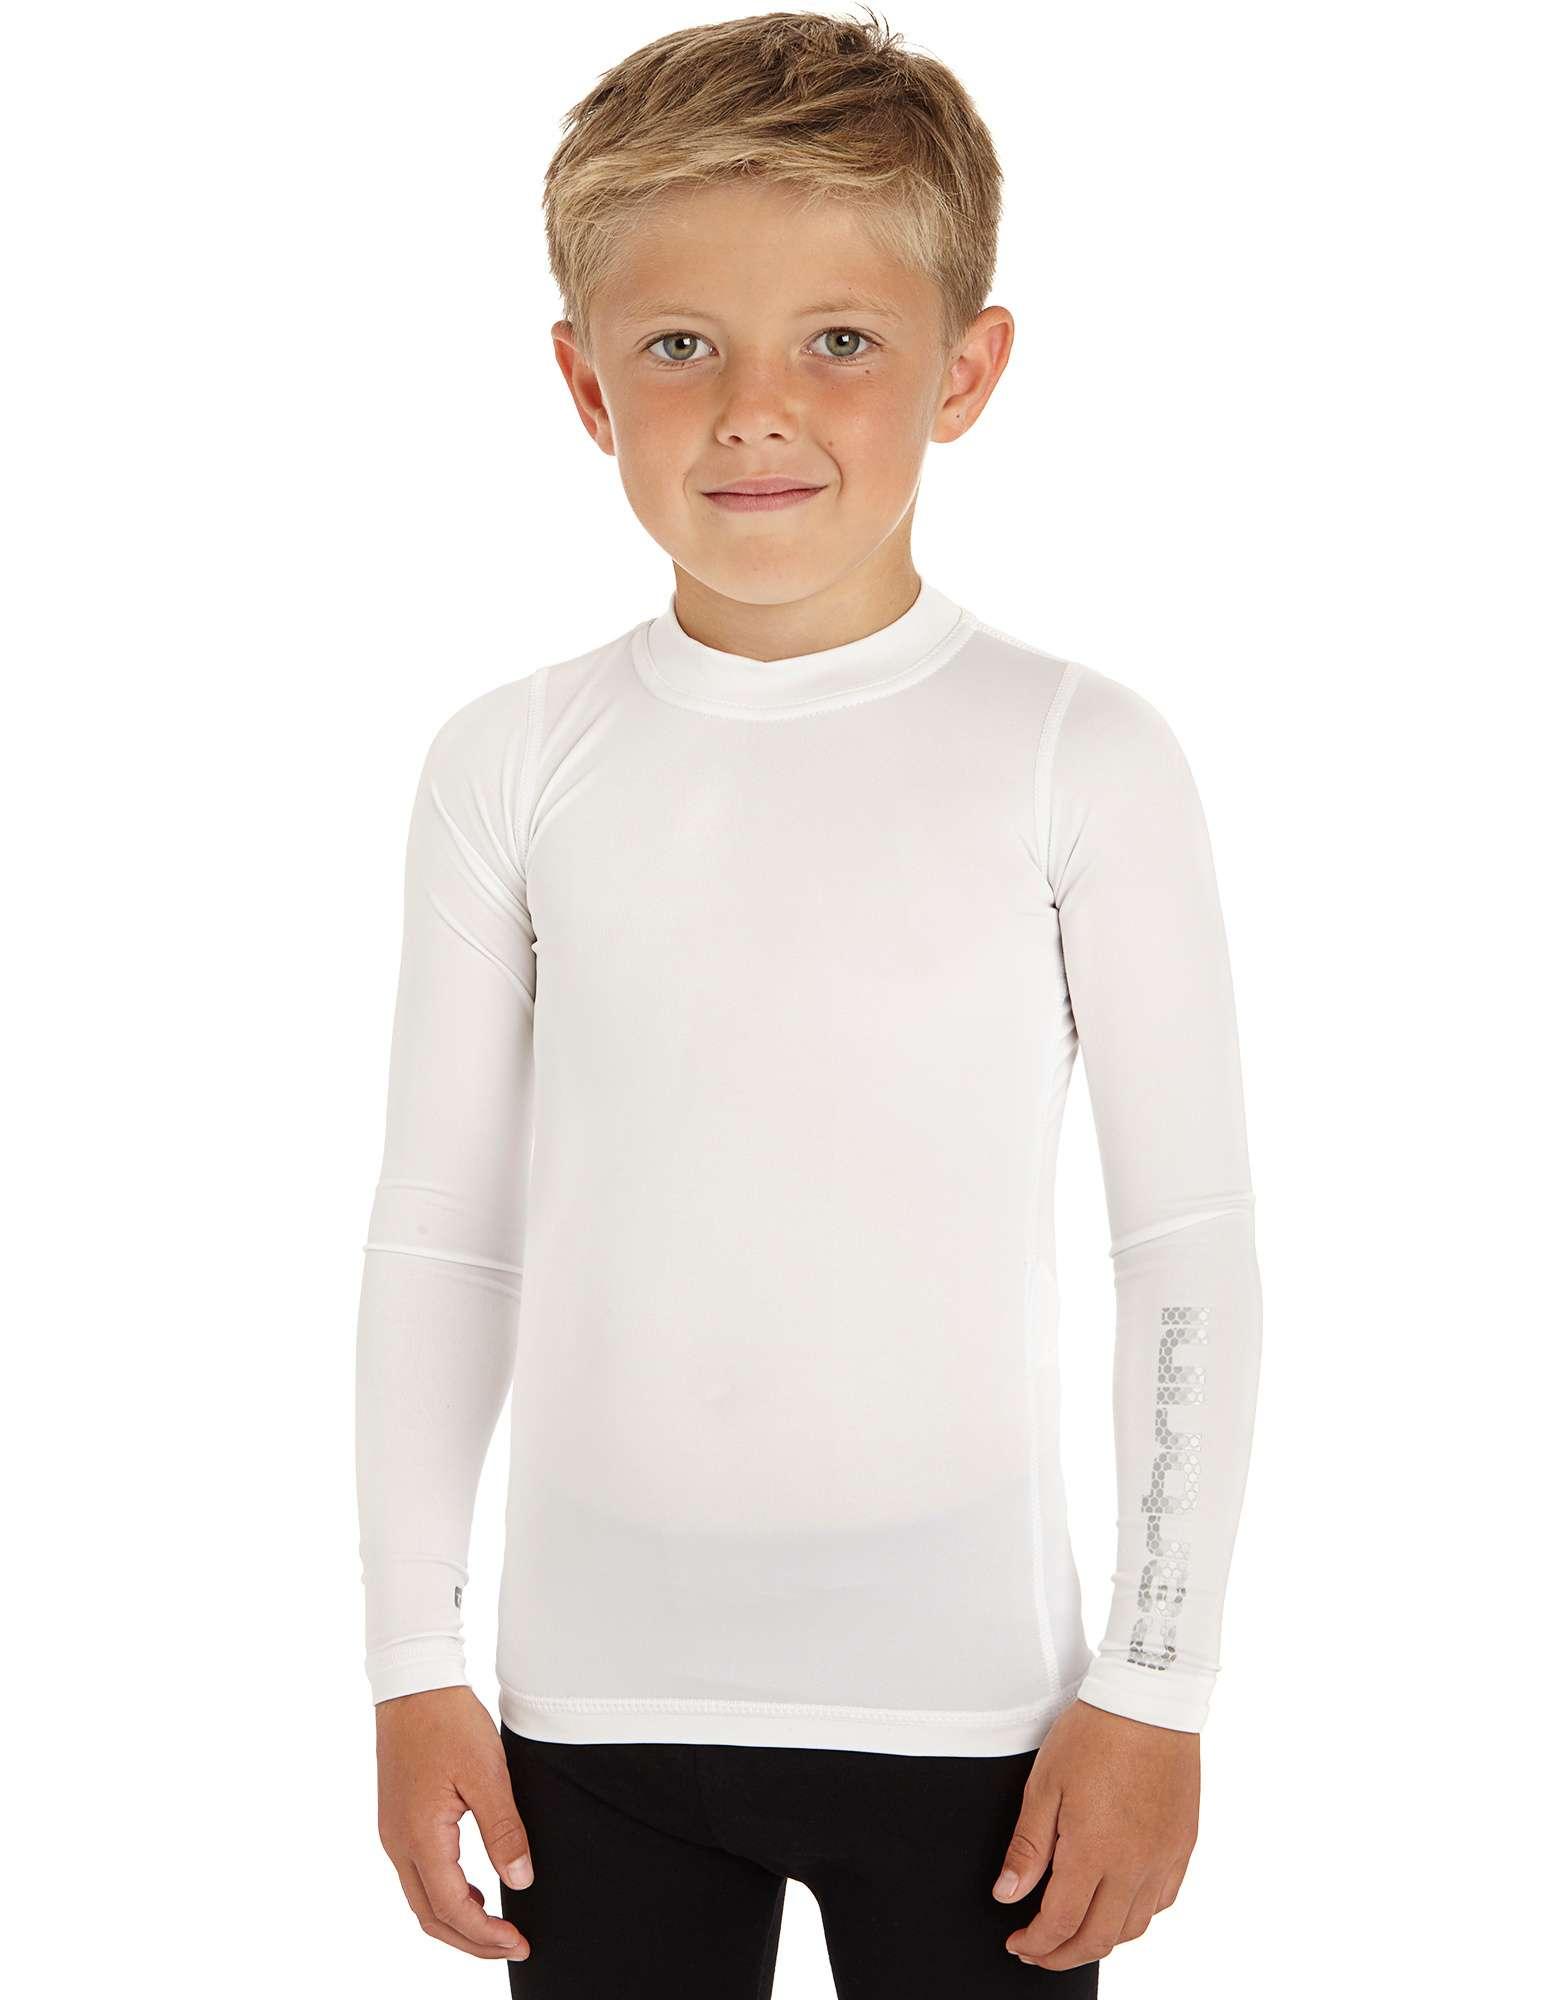 Carbrini Maximus Long Sleeve Baselayer Junior